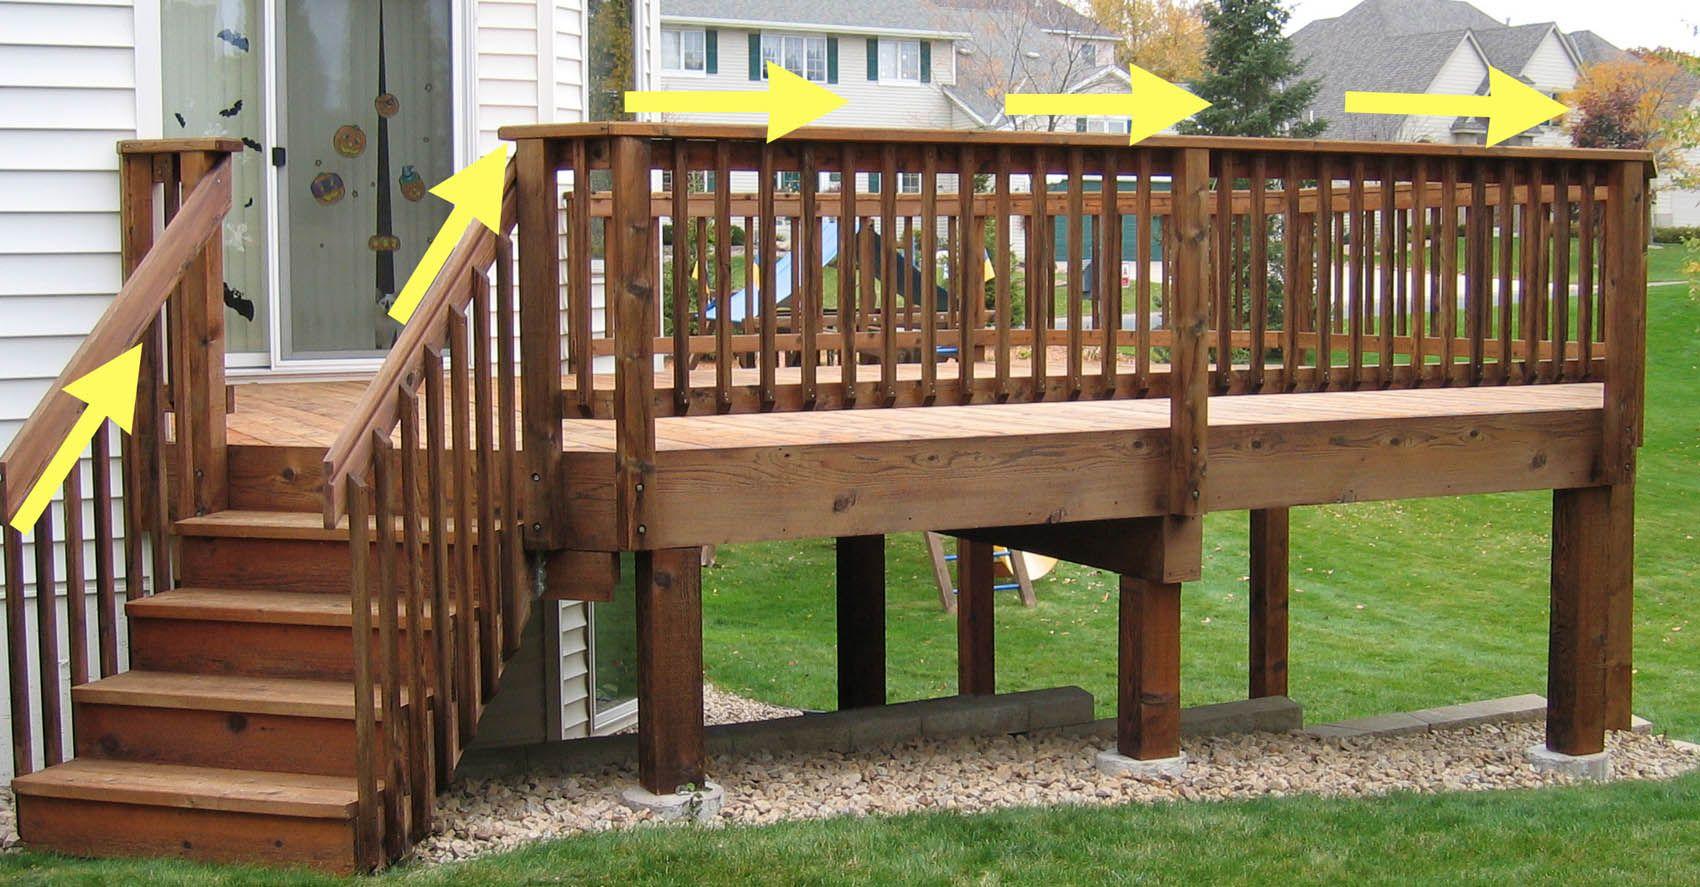 17 best images about deck railing ideas on pinterest wooden decks wood doors and wood railing